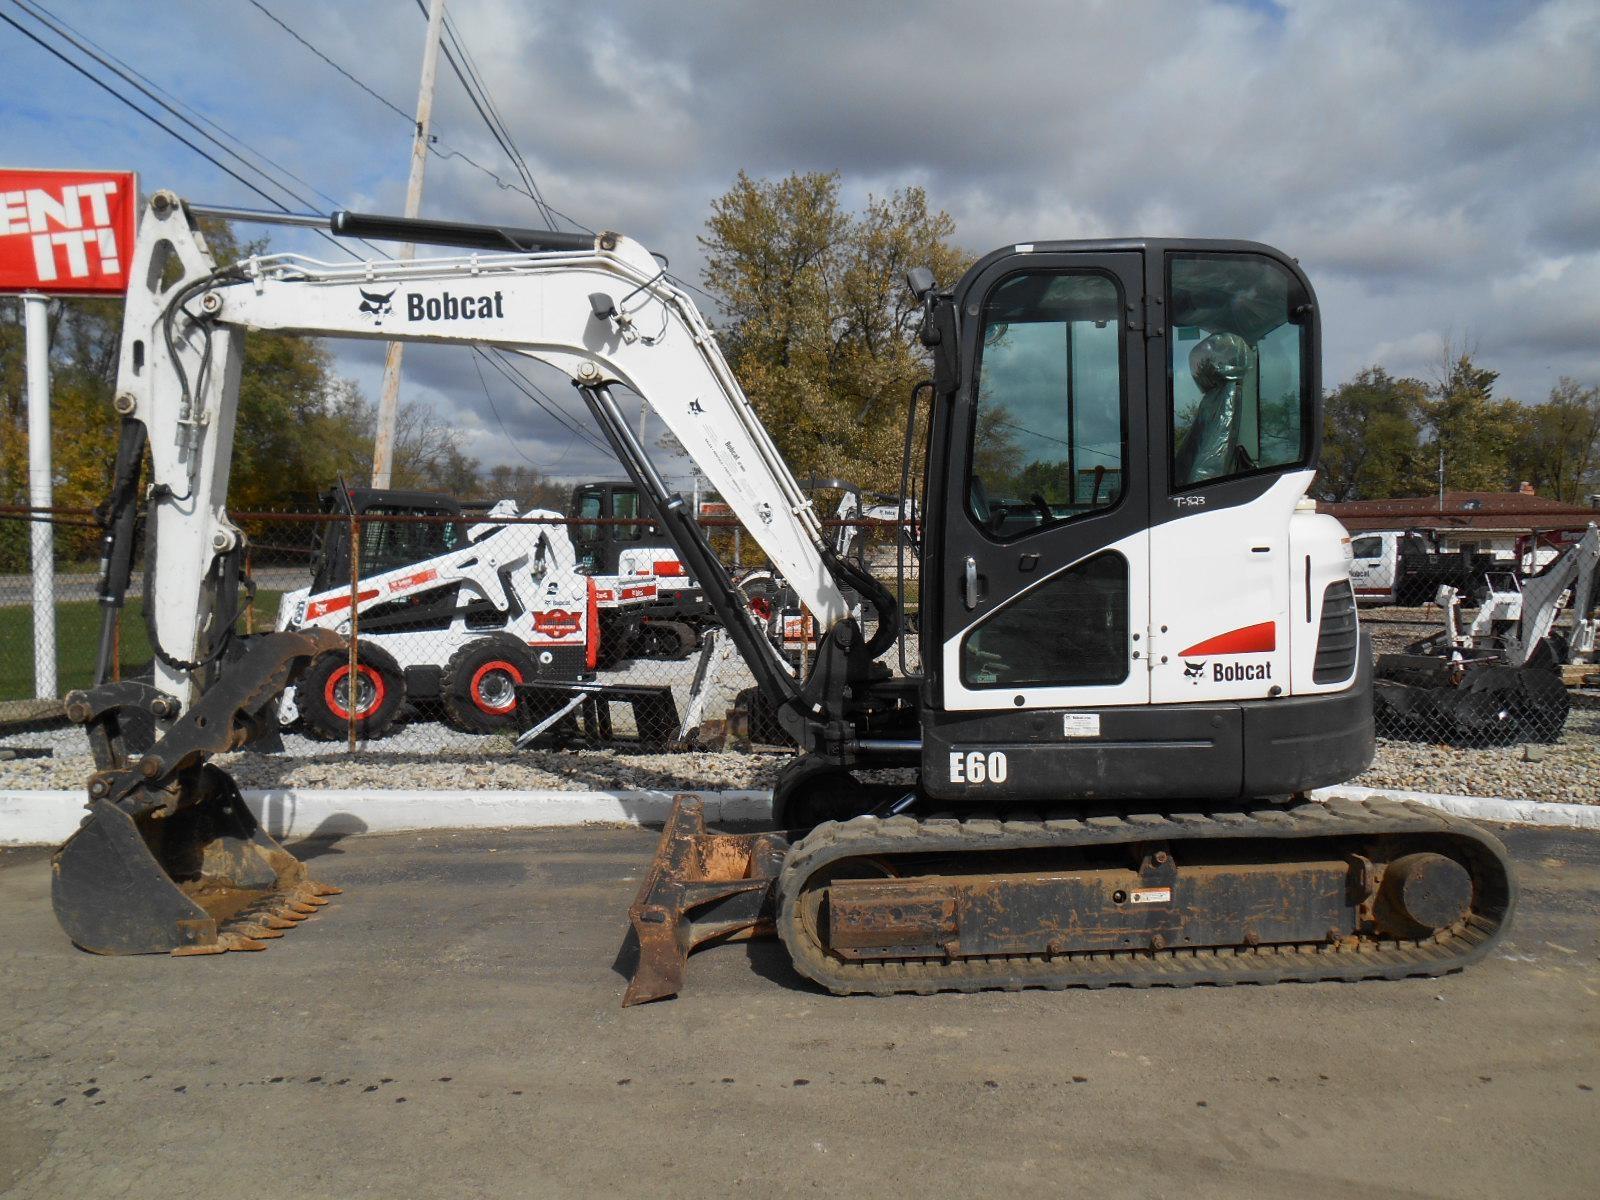 hight resolution of bobcat e60 compact excavator service manual download bobcat excavator e60 wiring diagram